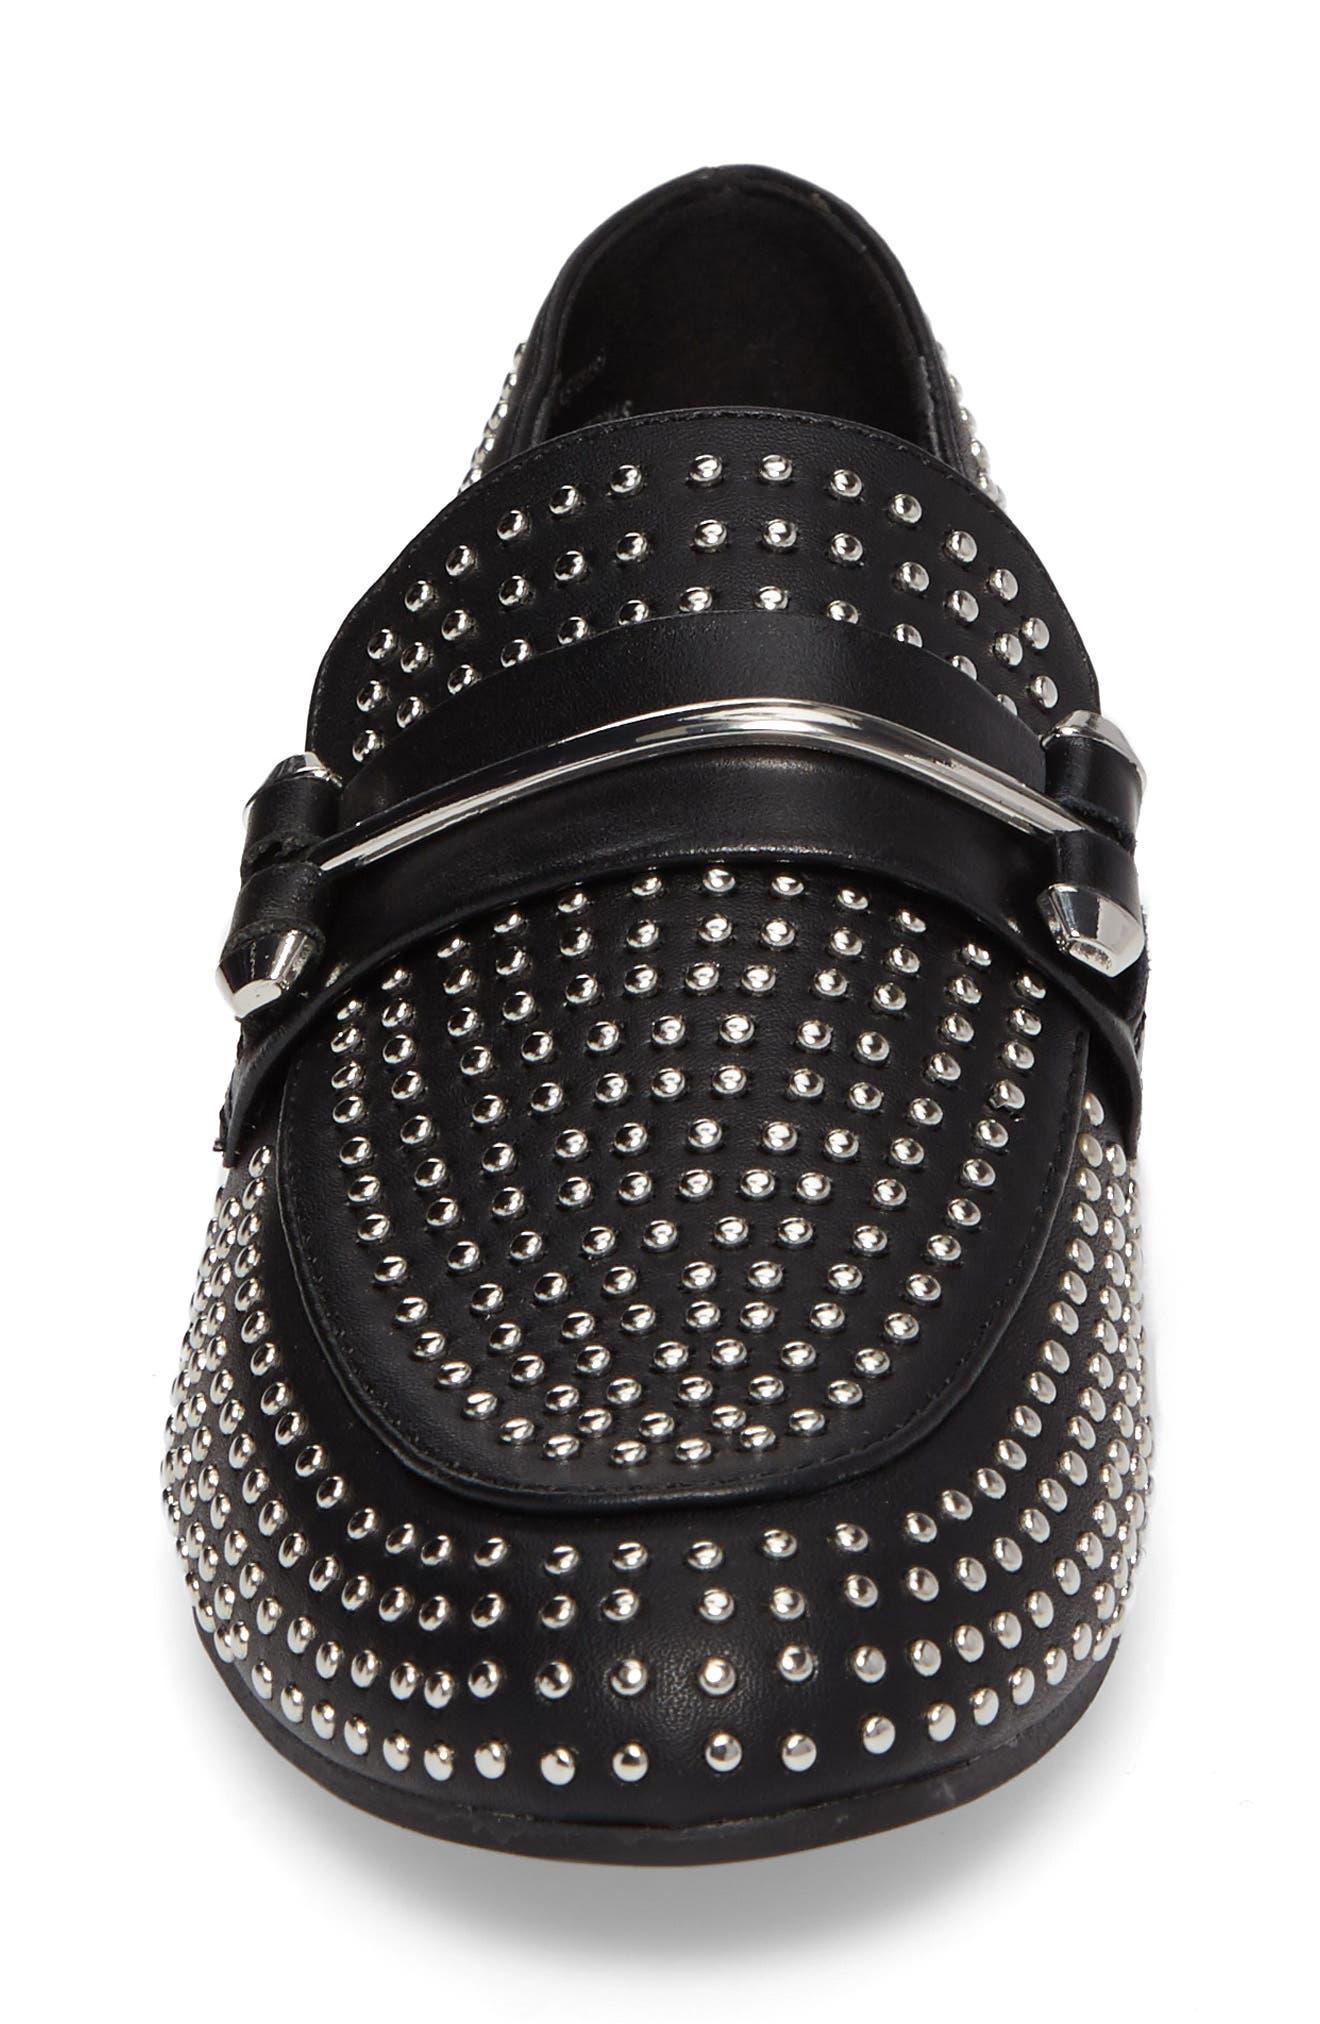 Kast Studded Loafer,                             Alternate thumbnail 4, color,                             Black Faux Leather